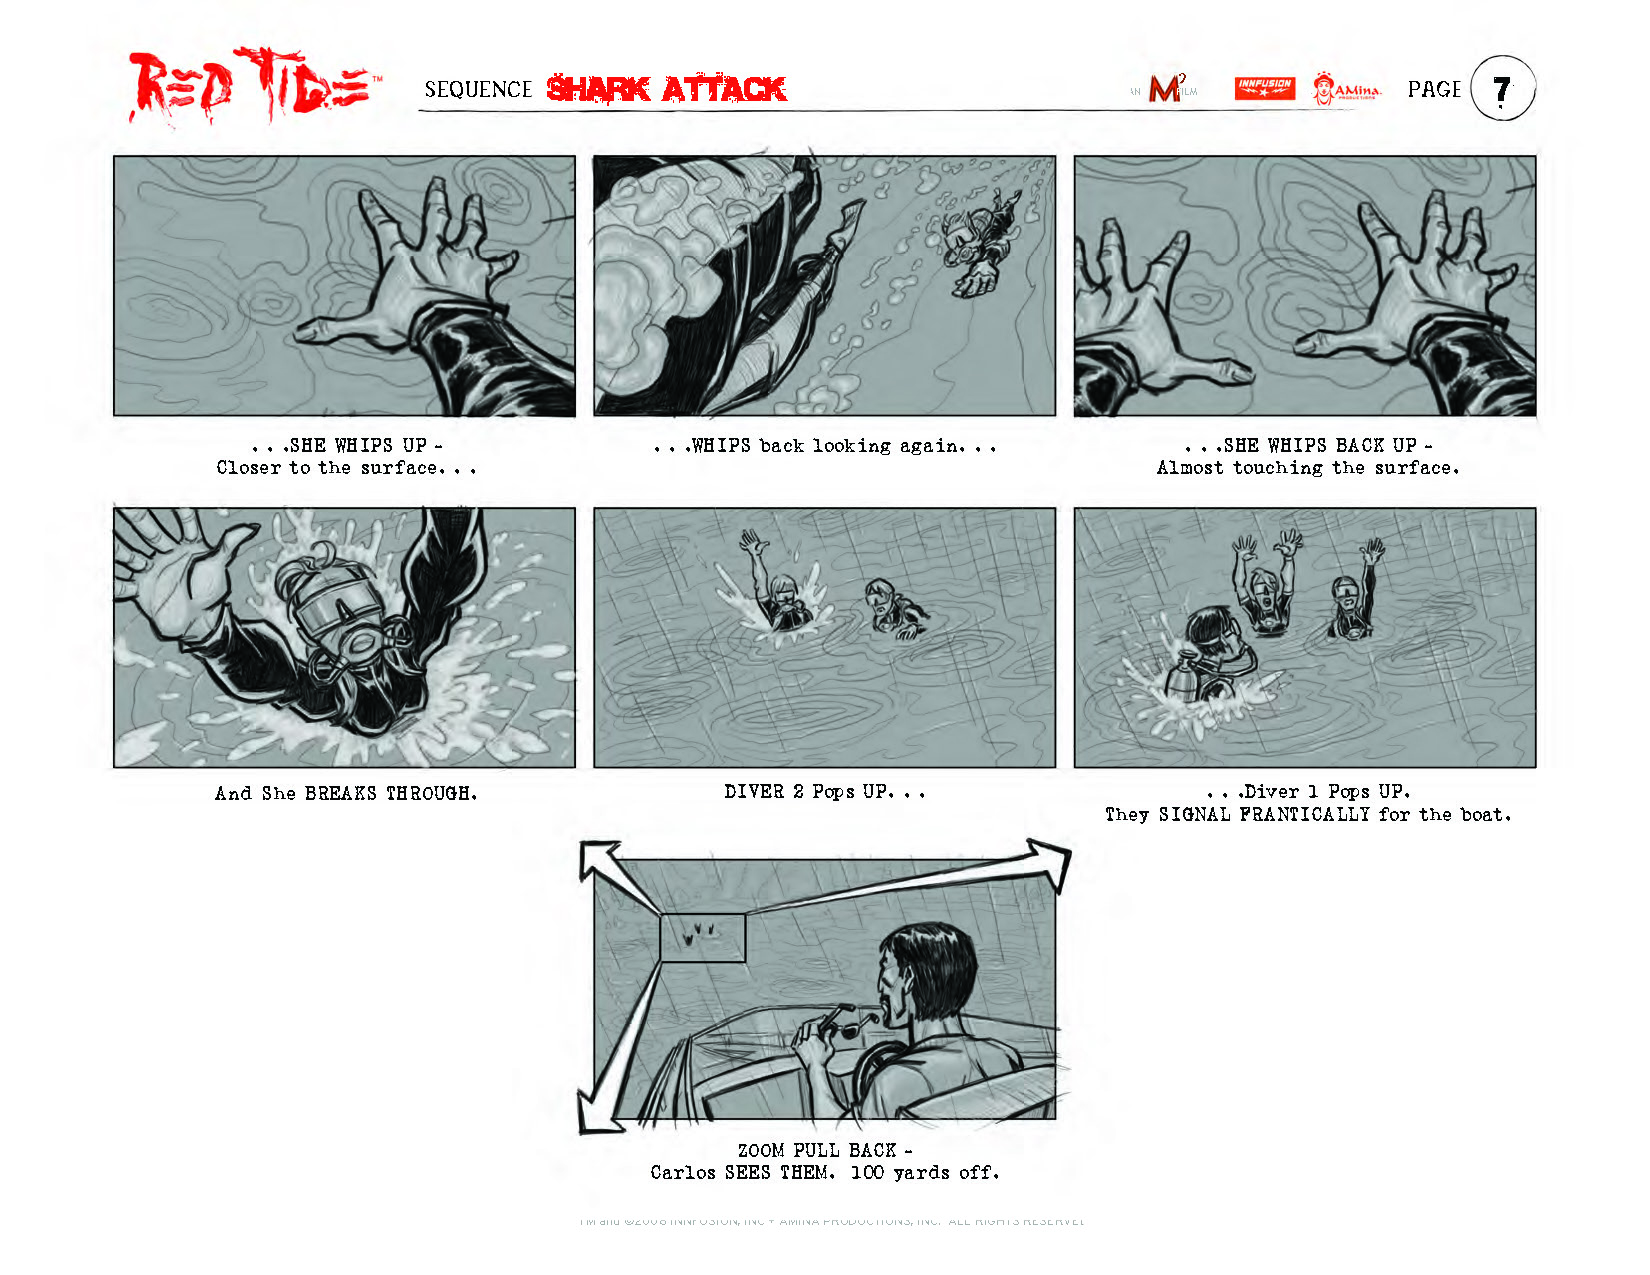 RedTide_Boards_SharkAttack_Page_08.jpg